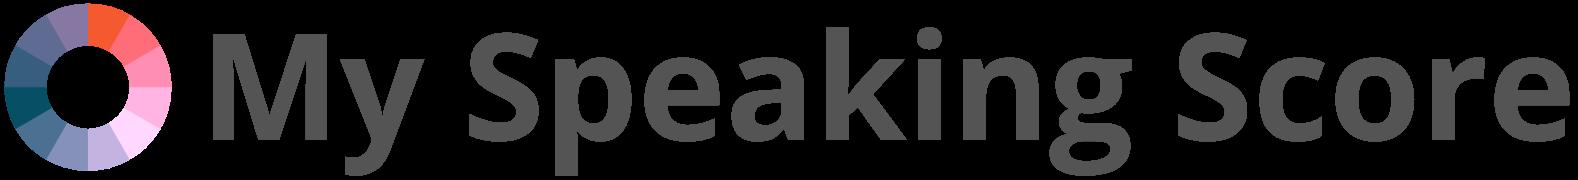 My Speaking Score Image